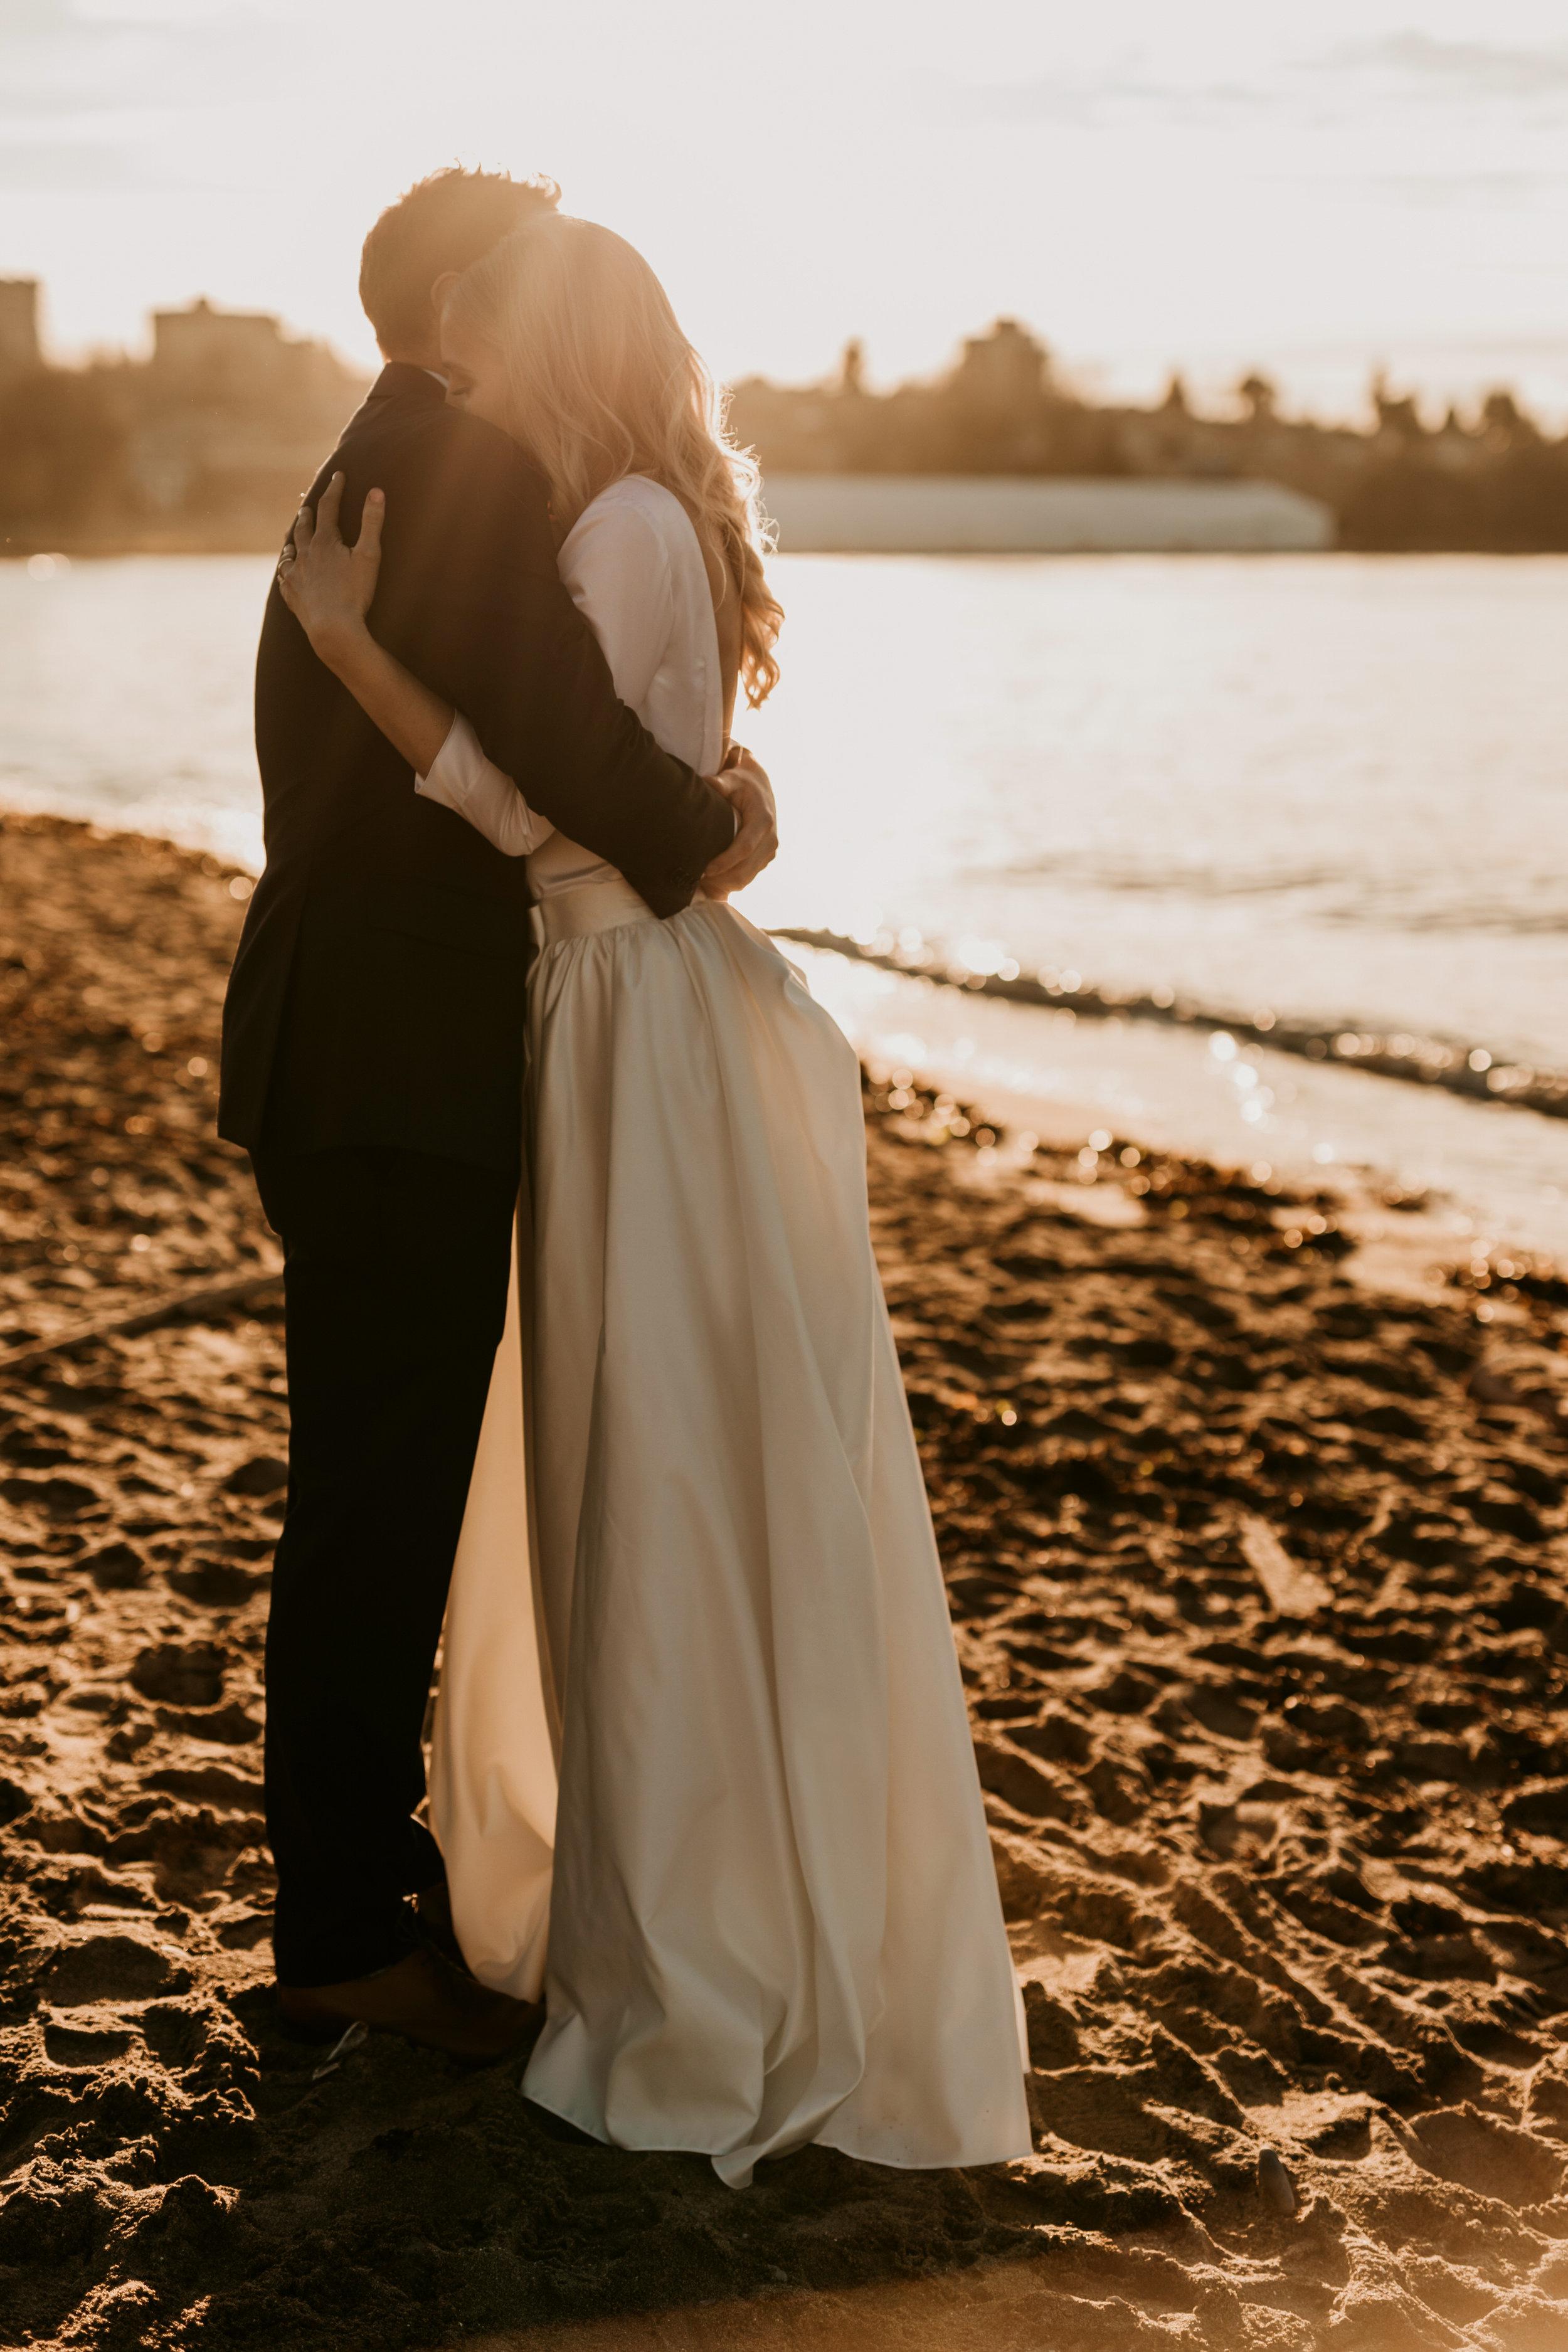 Vancouver Wedding Photos - Vegan Wedding Photographer - New Years Eve Wedding Photos - Vancouver Wedding Photographer - Vancouver Wedding Videographer - 680.JPG